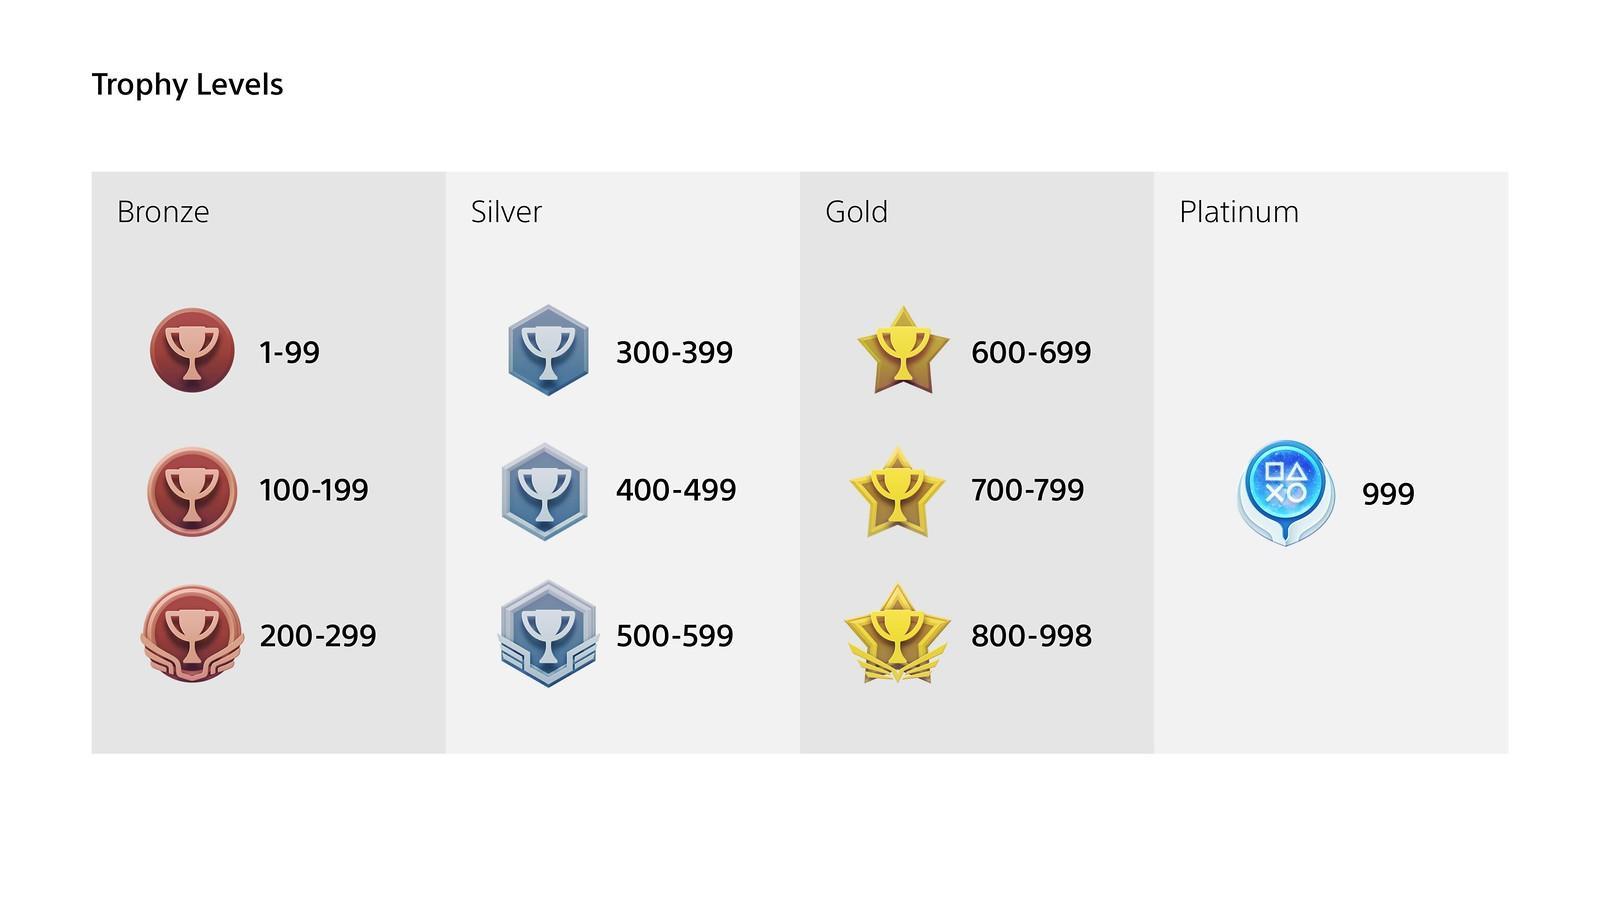 Troféus do PlayStation (3)